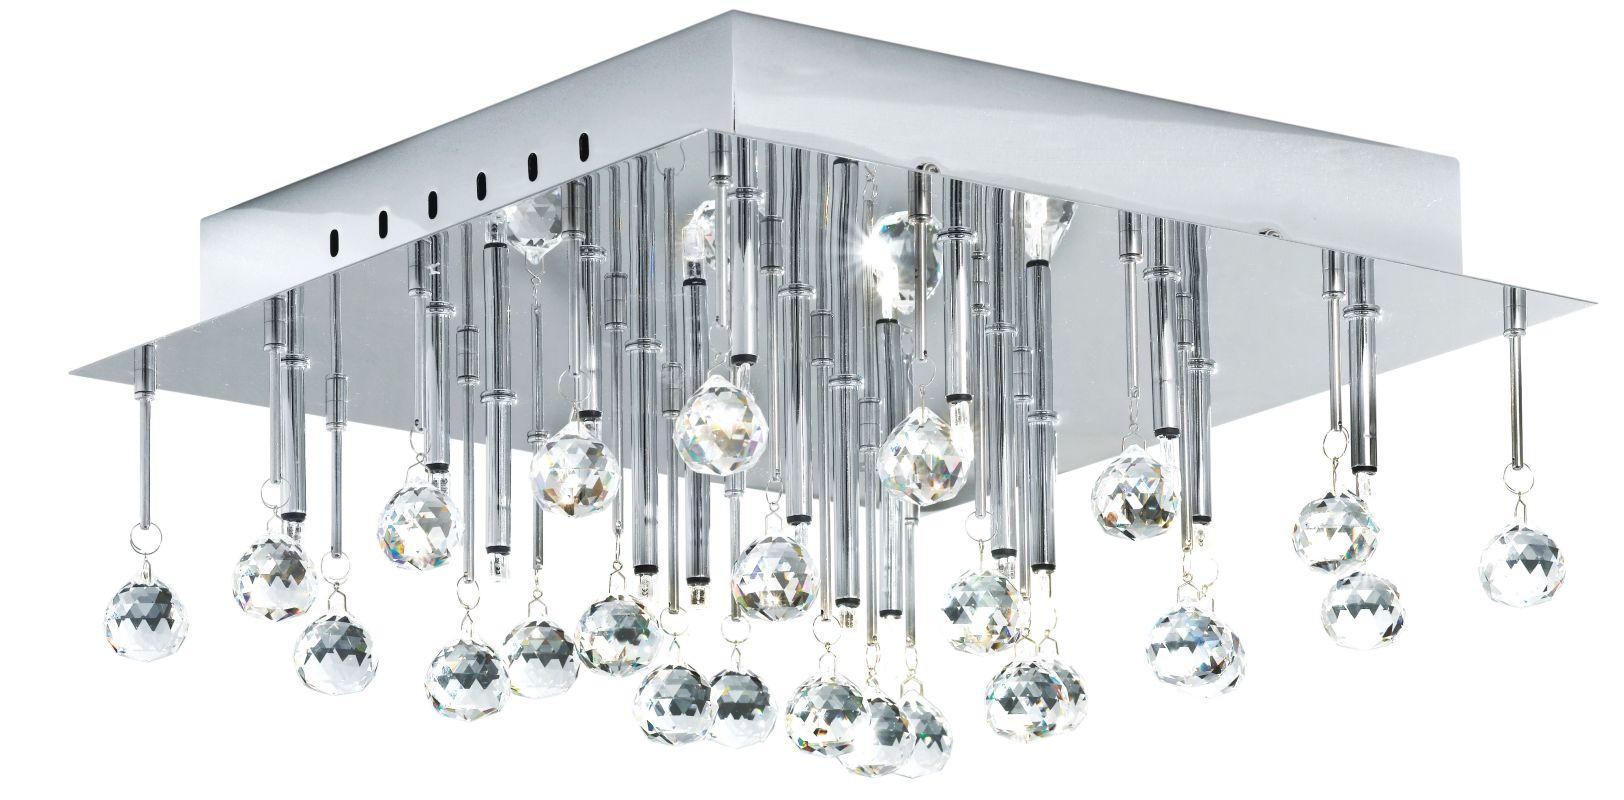 Eglo 89779A 16 Light Semi-Flush Ceiling Fixture from the Soraya